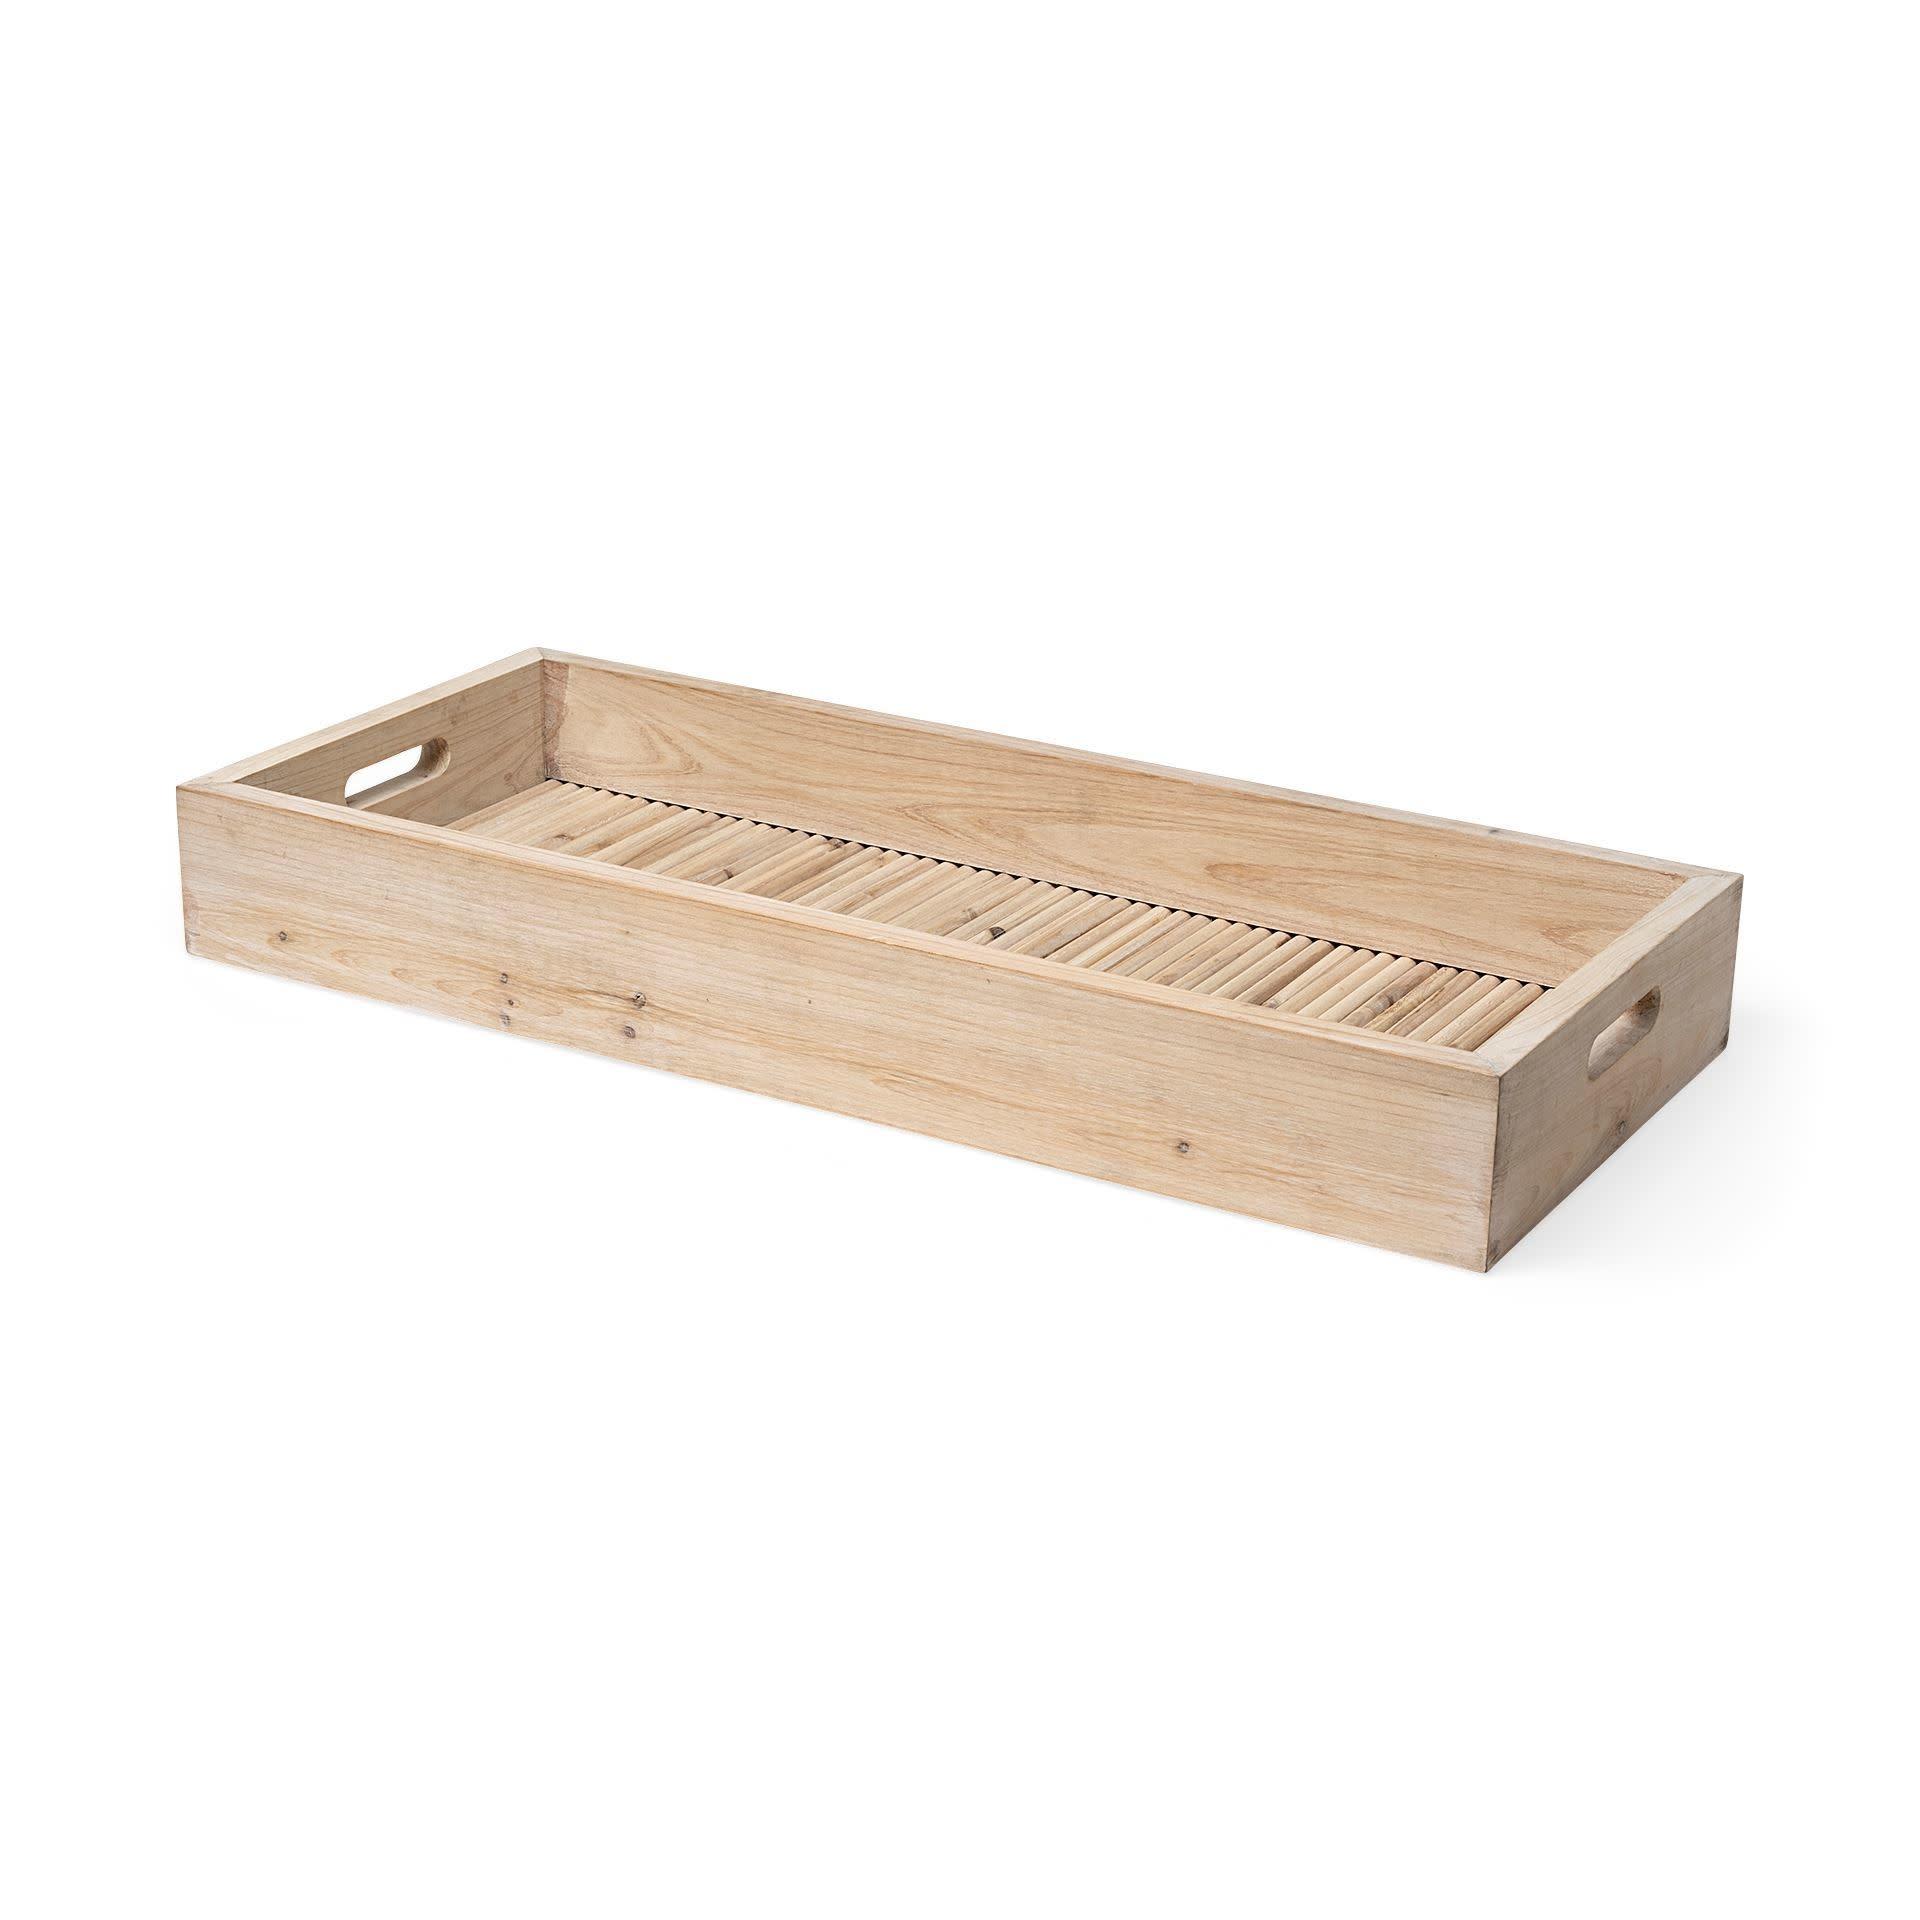 Horatio Natural Wood Rectangular Serving Tray